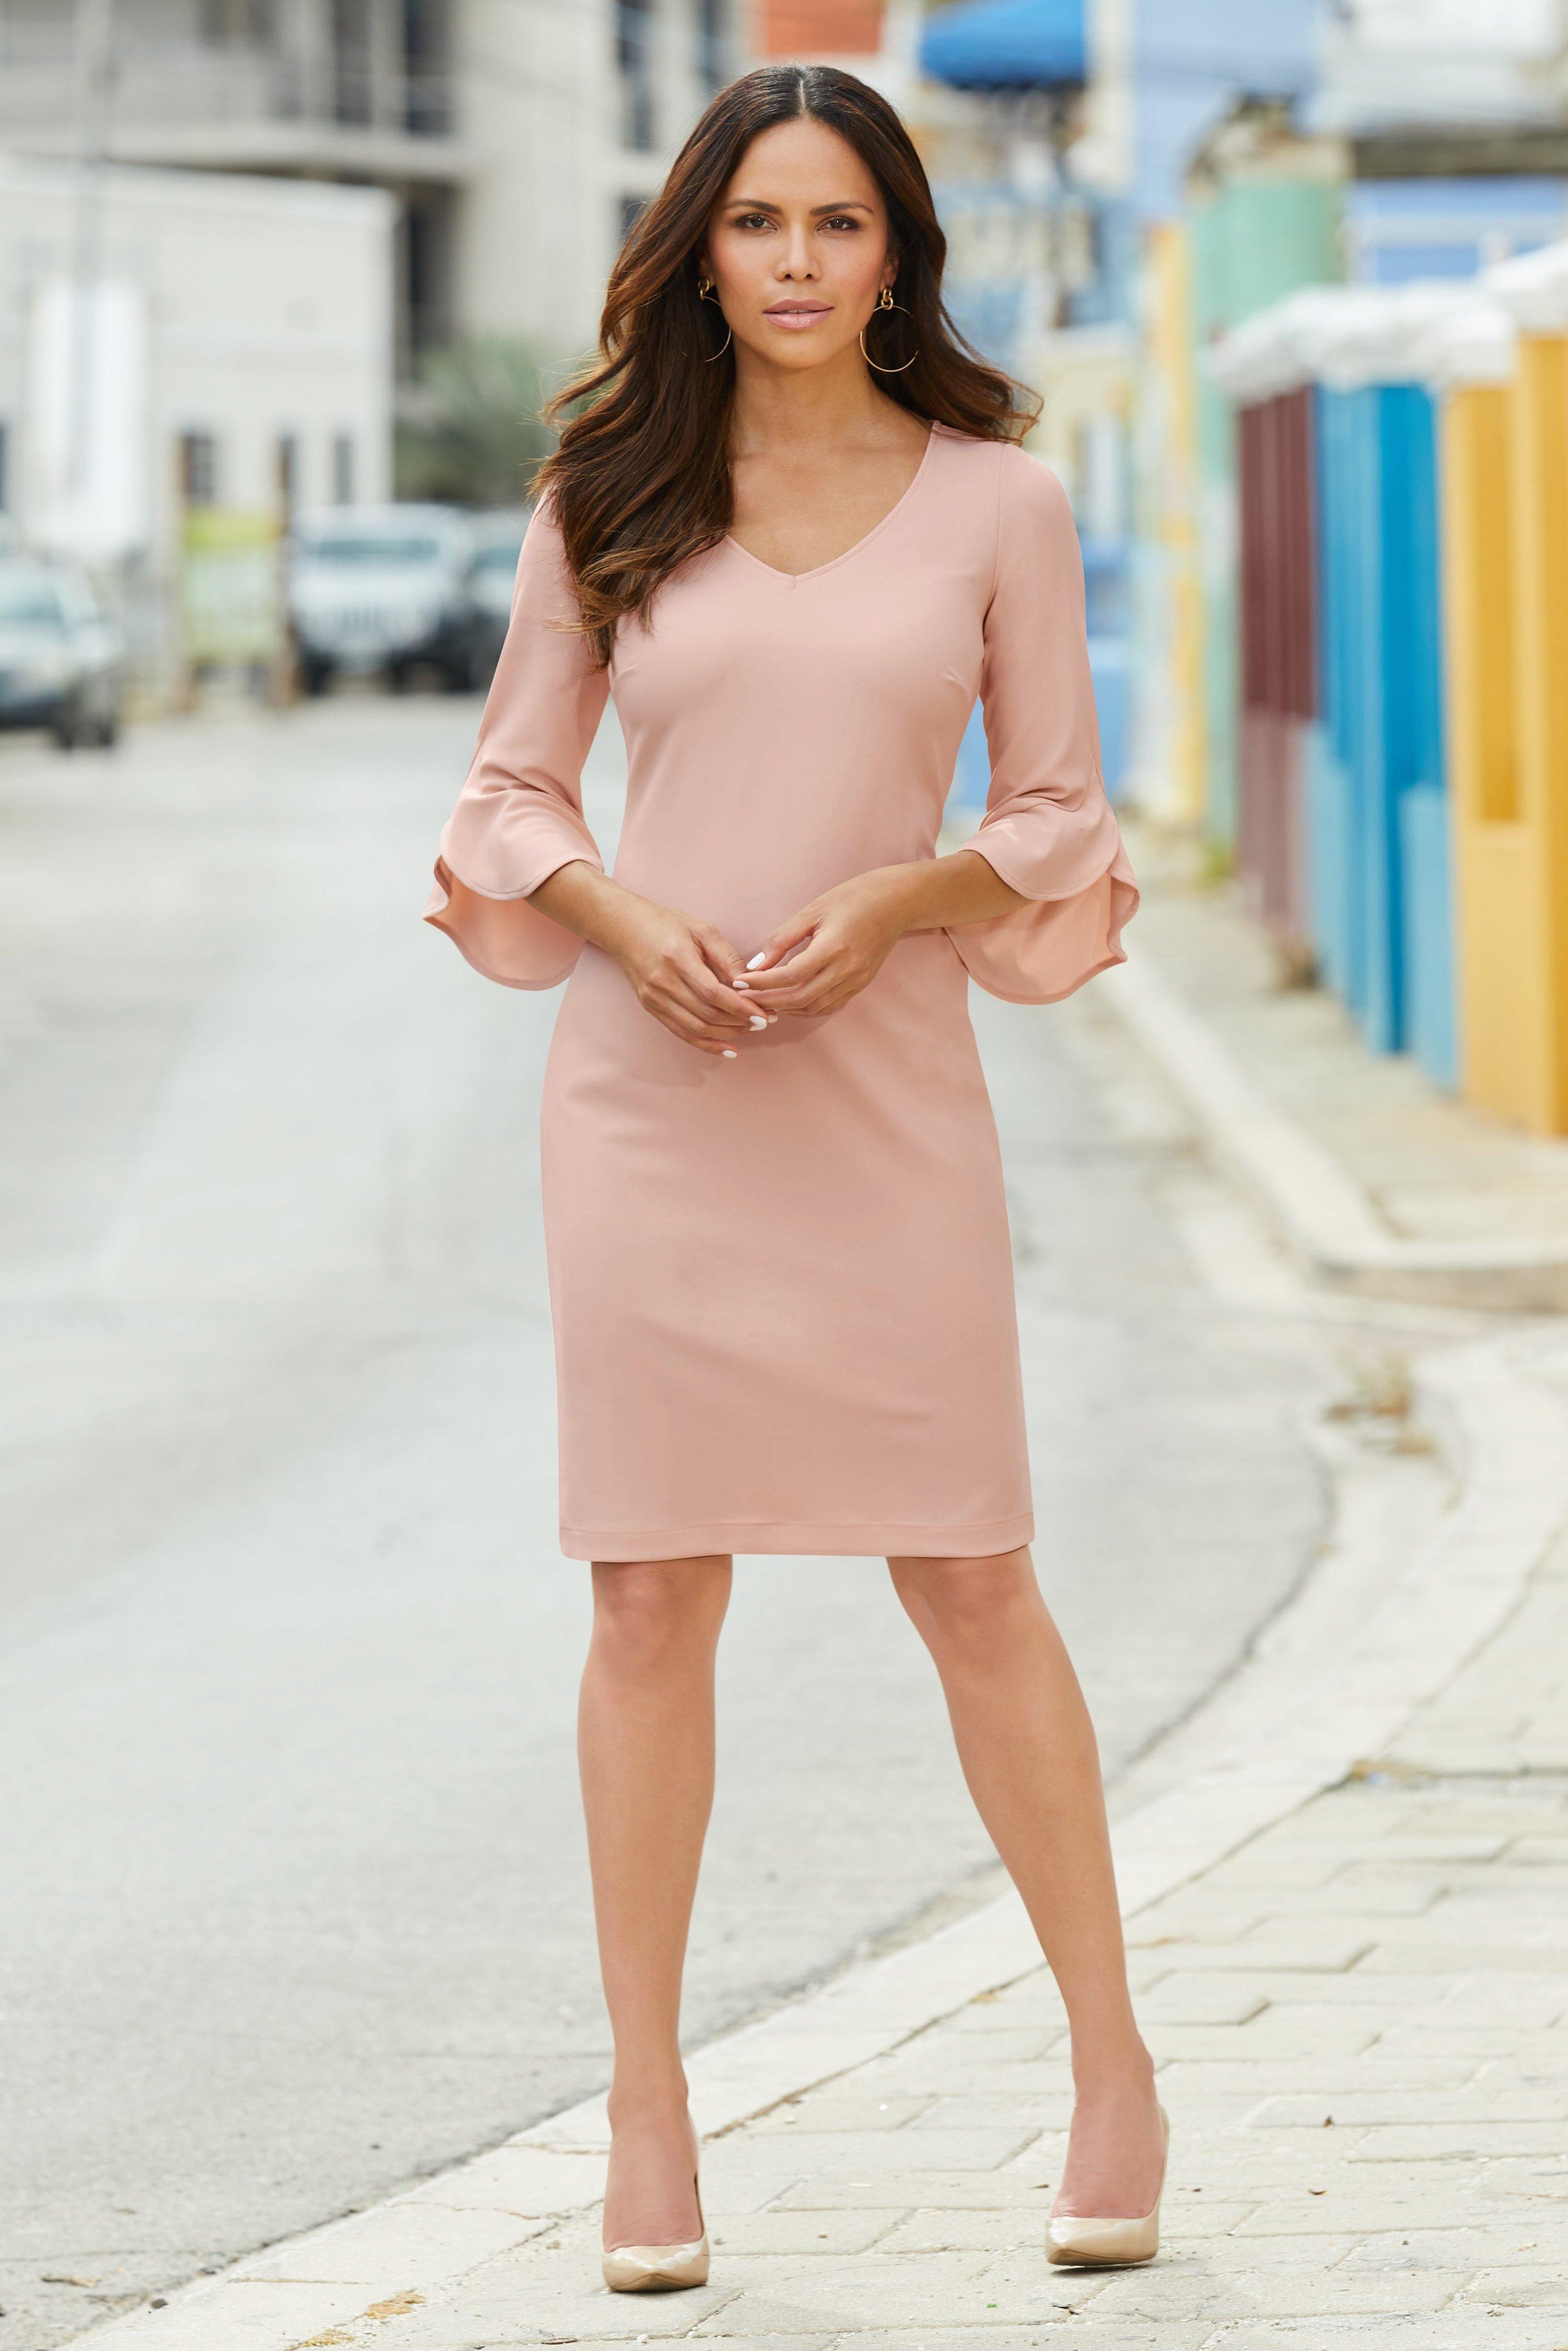 Beyond Travel V Neck Flare Sleeve Sheath Dress Summer Dresses For Women Dresses Sheath Dress [ 4150 x 2768 Pixel ]